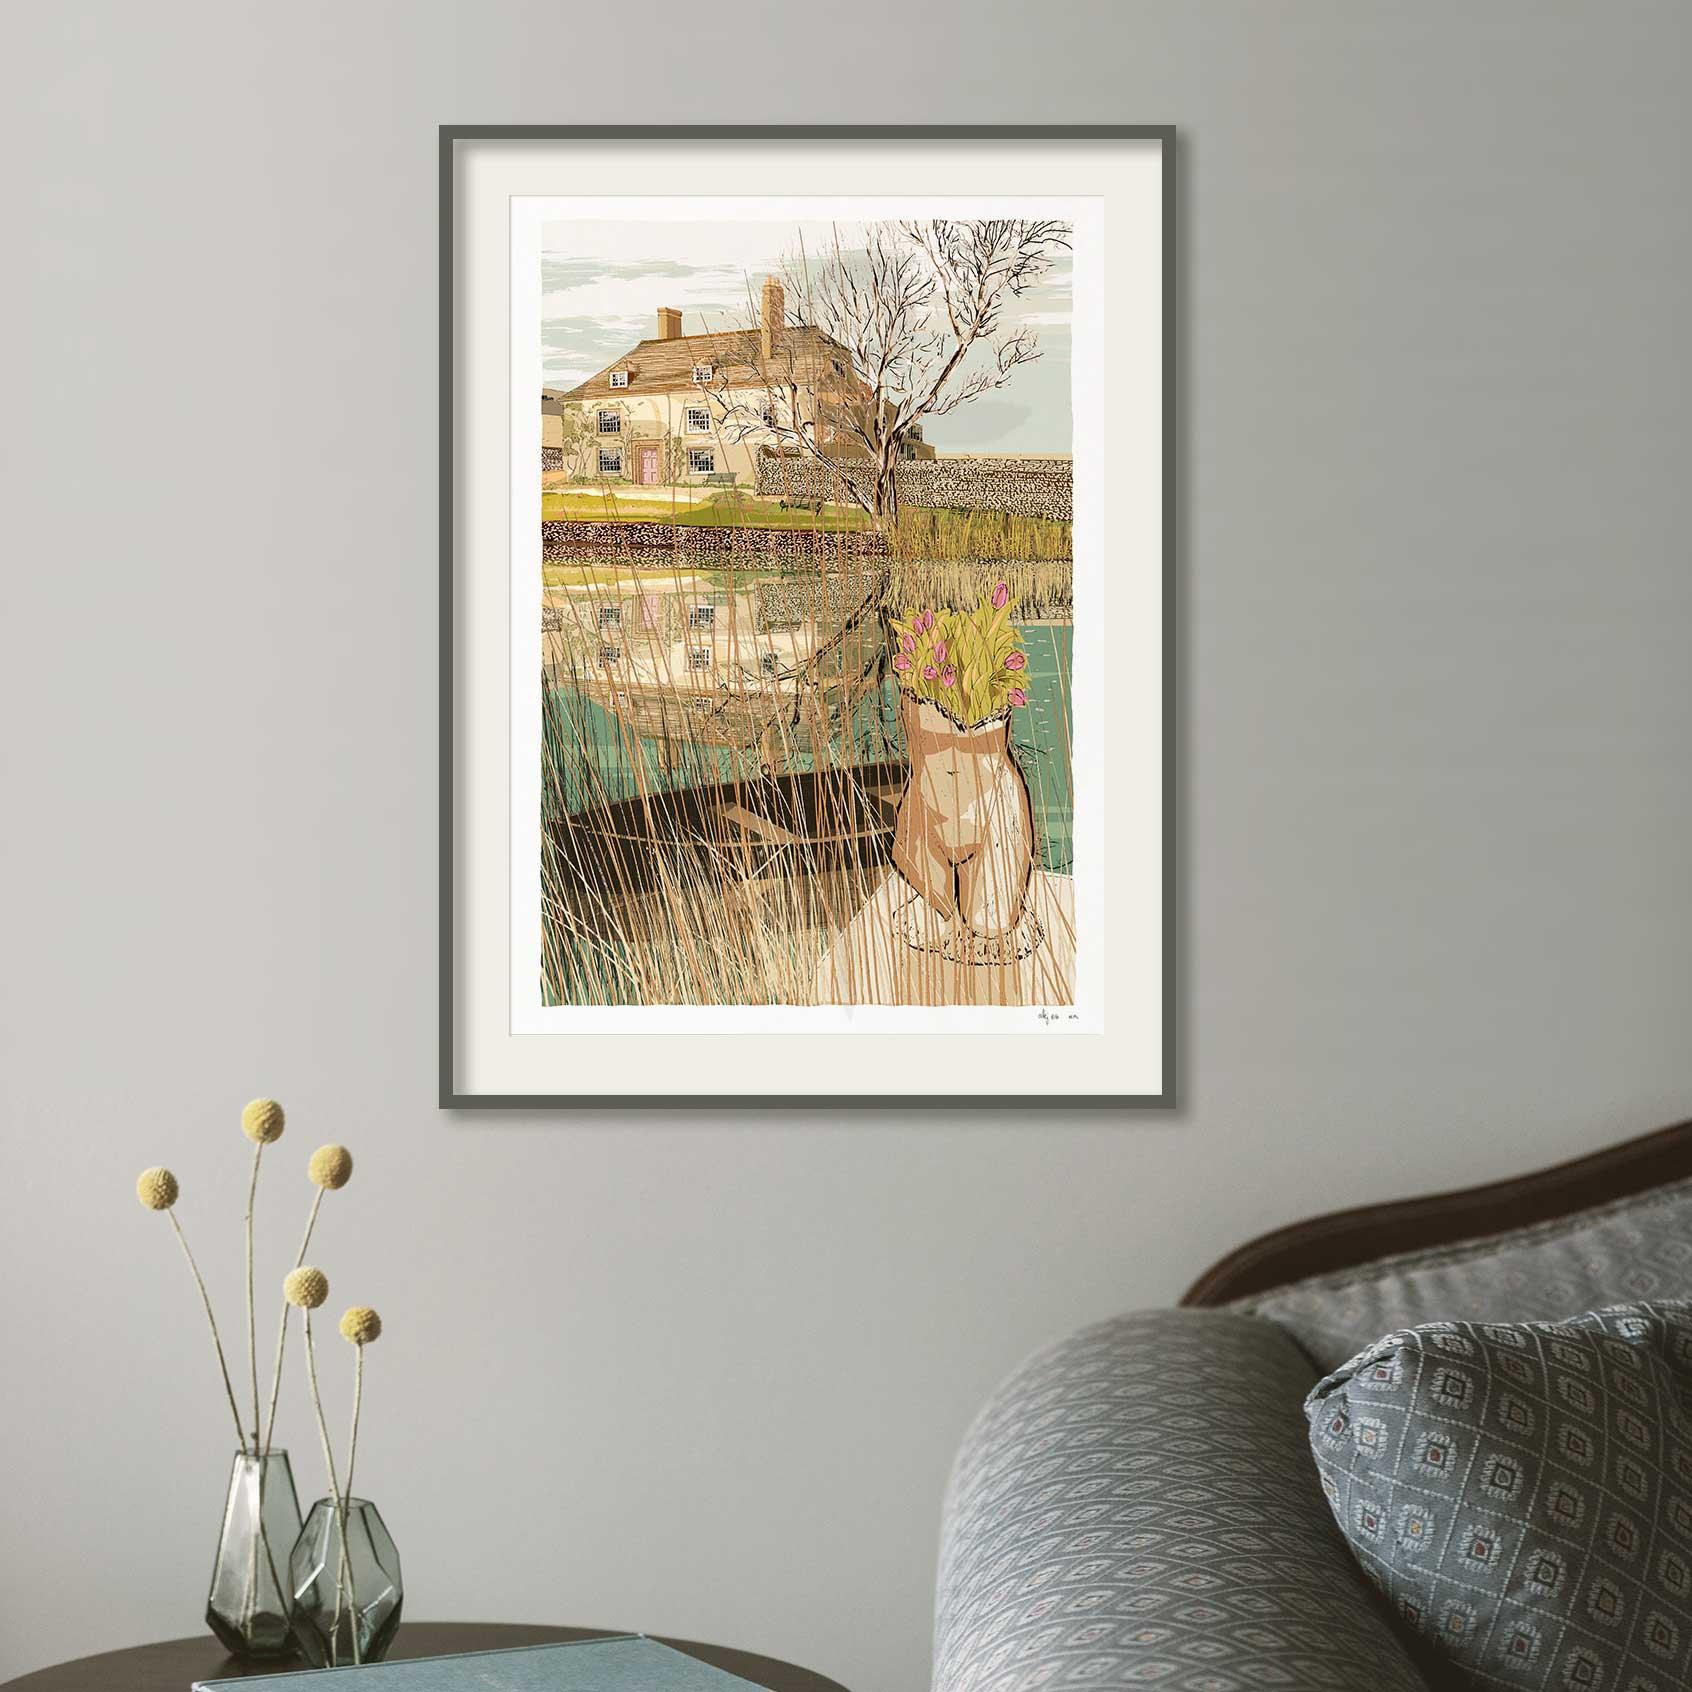 Framed art print by artist alej ez titled The Pond at Charsleston Bloomsbury